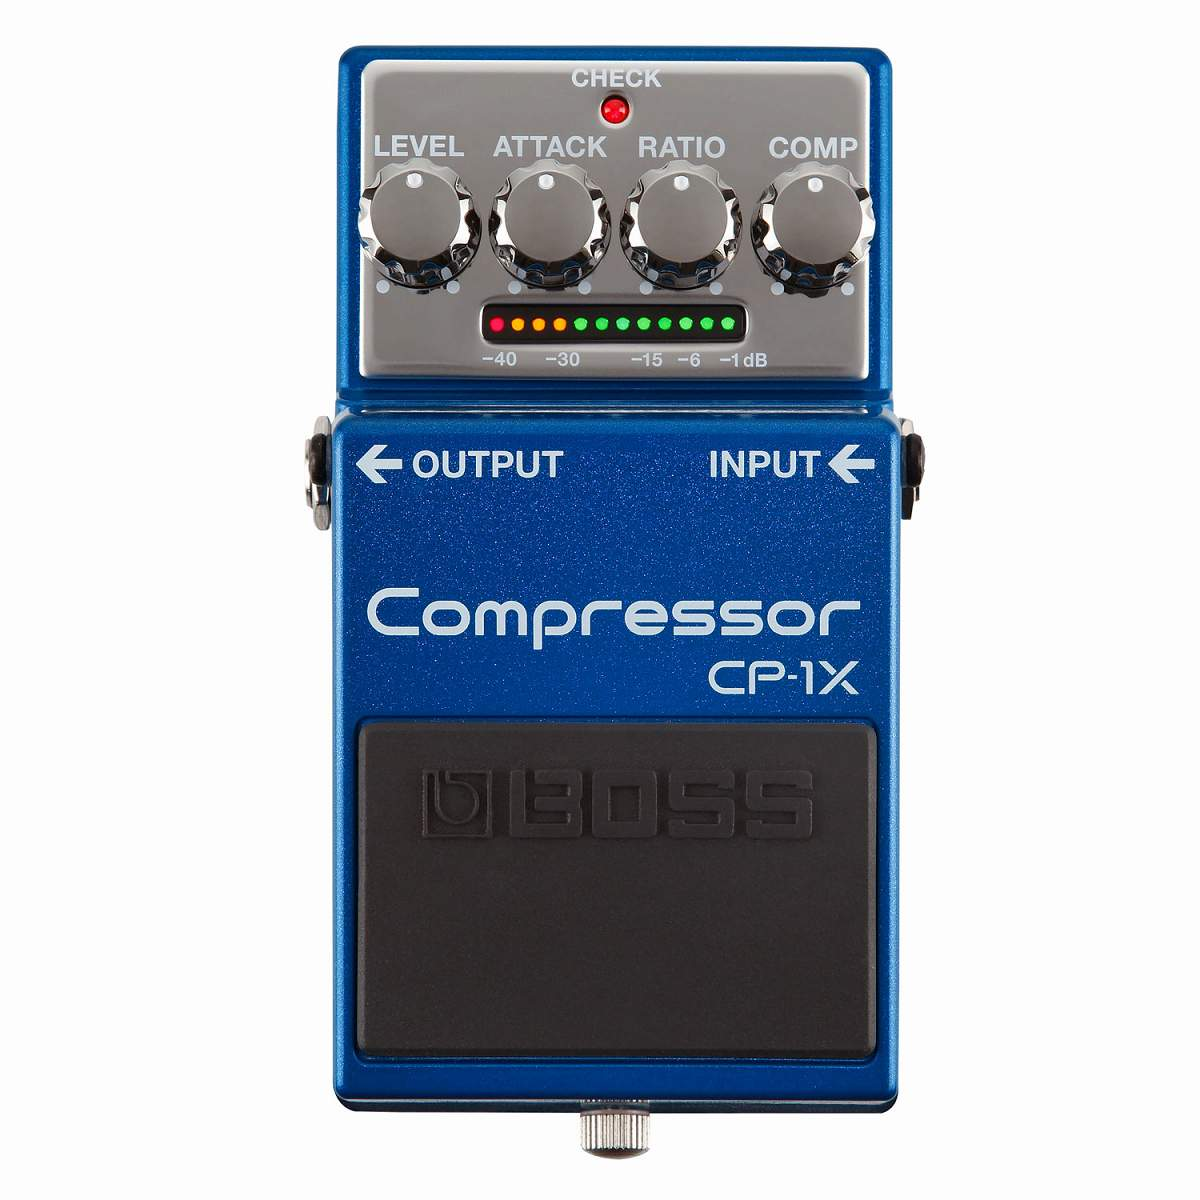 BOSS / CP-1X Compressor 【福岡パルコ店】